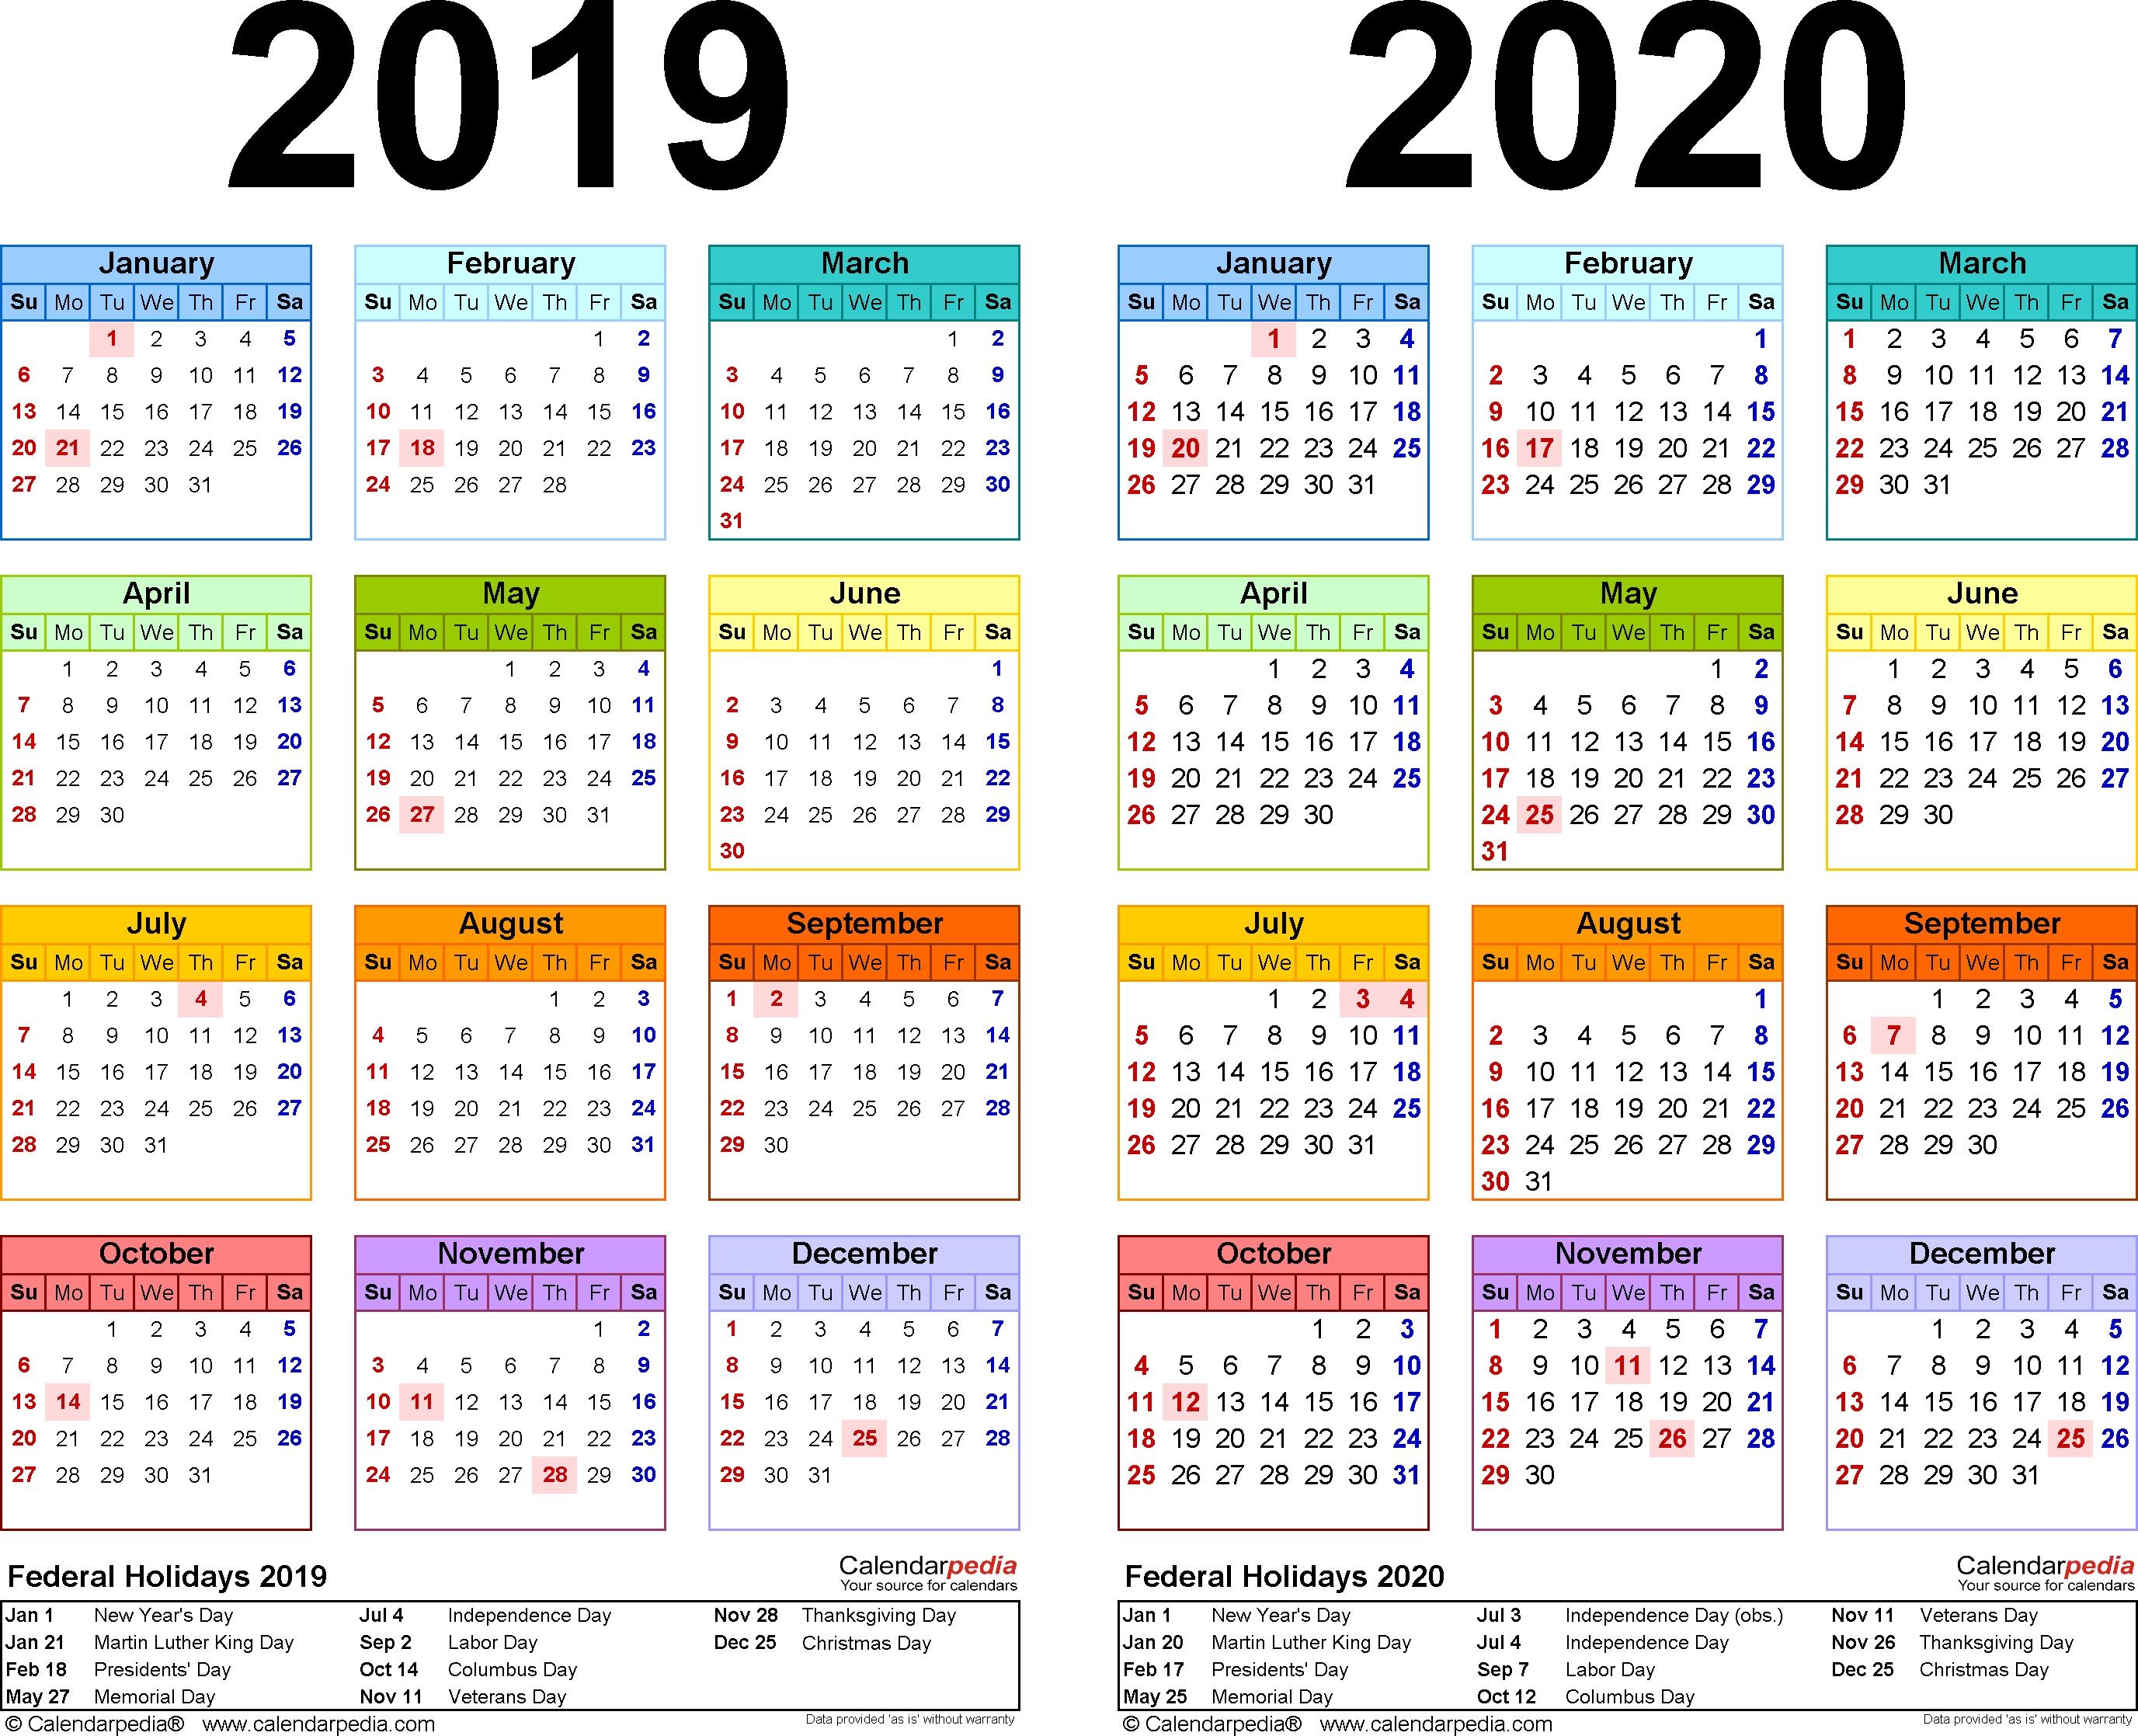 2019-2020 Calendar - Free Printable Two-Year Pdf Calendars regarding Calendar To Type On 2019 - 2020